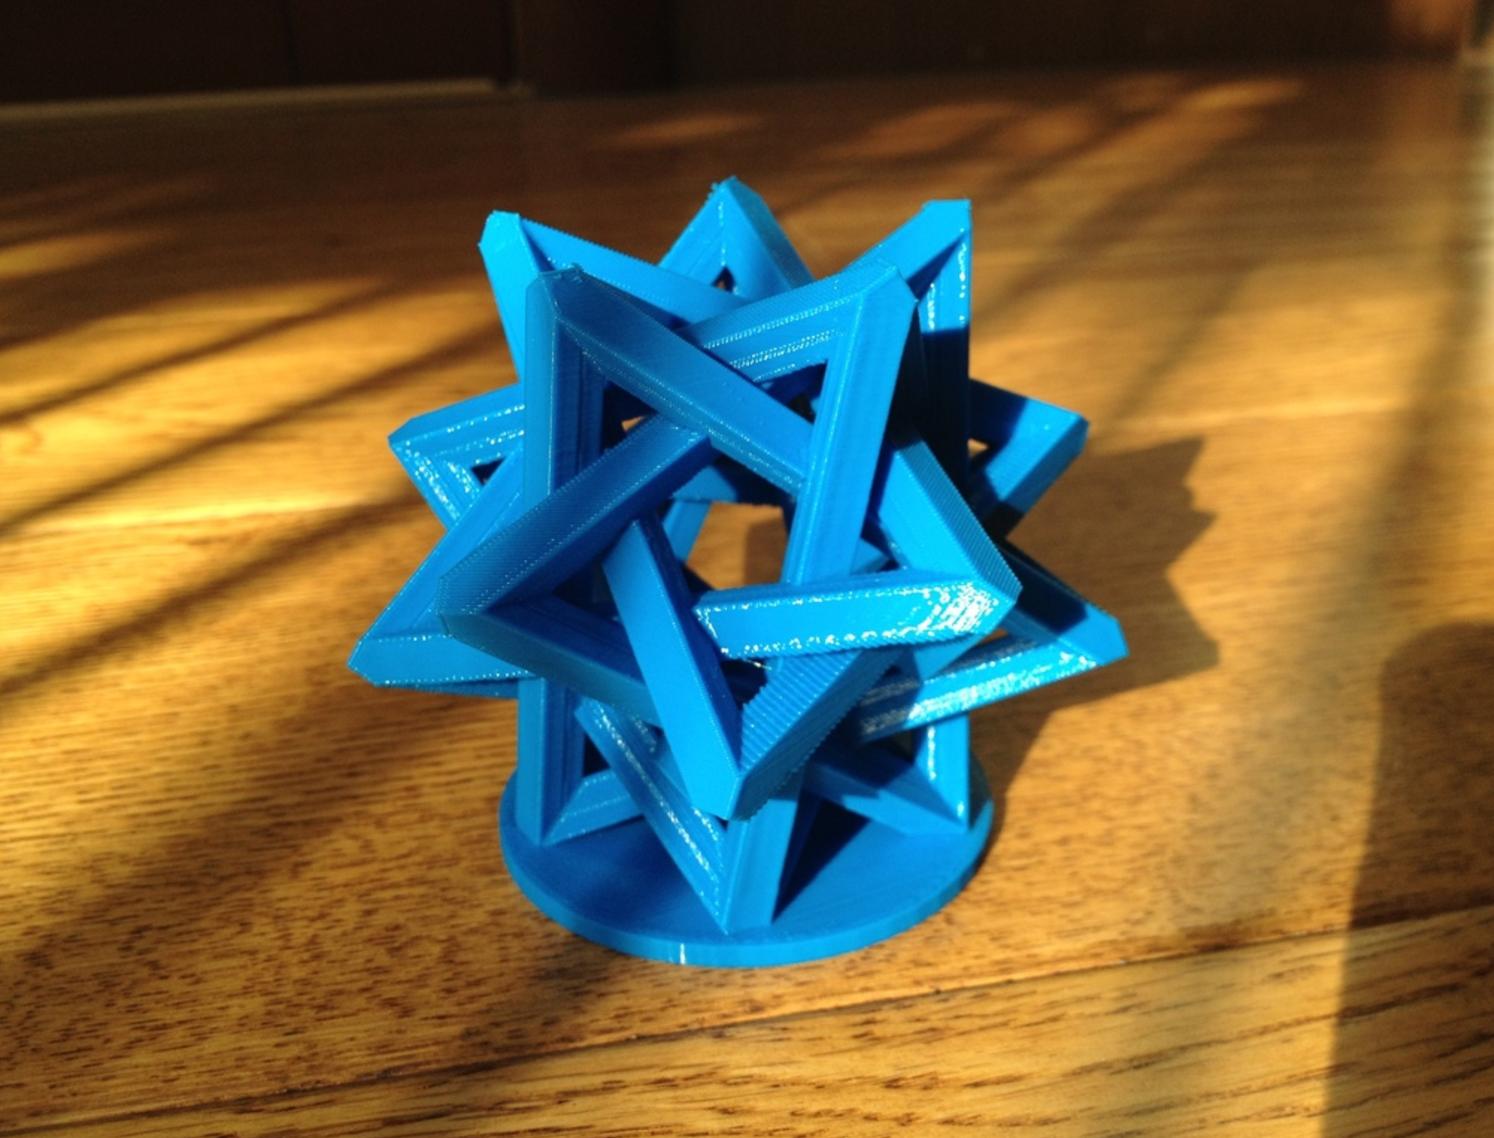 Capture d'écran 2017-03-22 à 16.12.44.png Download free STL file Interlocking Tetrahedra • 3D printing object, Roger